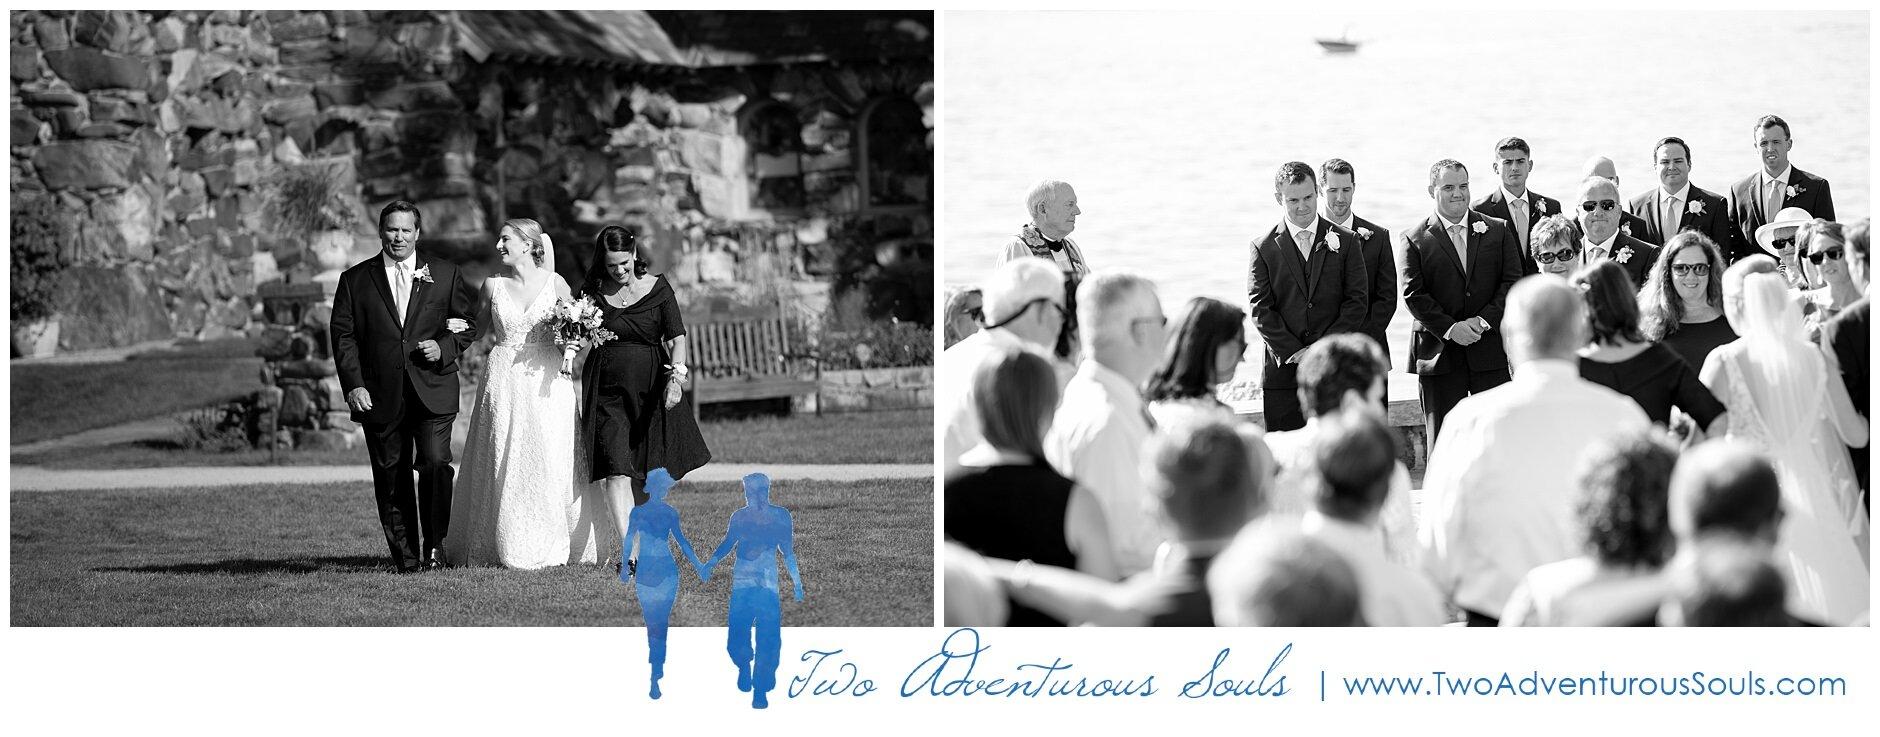 Breakwater Inn and Spa Wedding Photographers, Kennebunkport Wedding Photographers, Two Adventurous Souls- 092119_0028.jpg